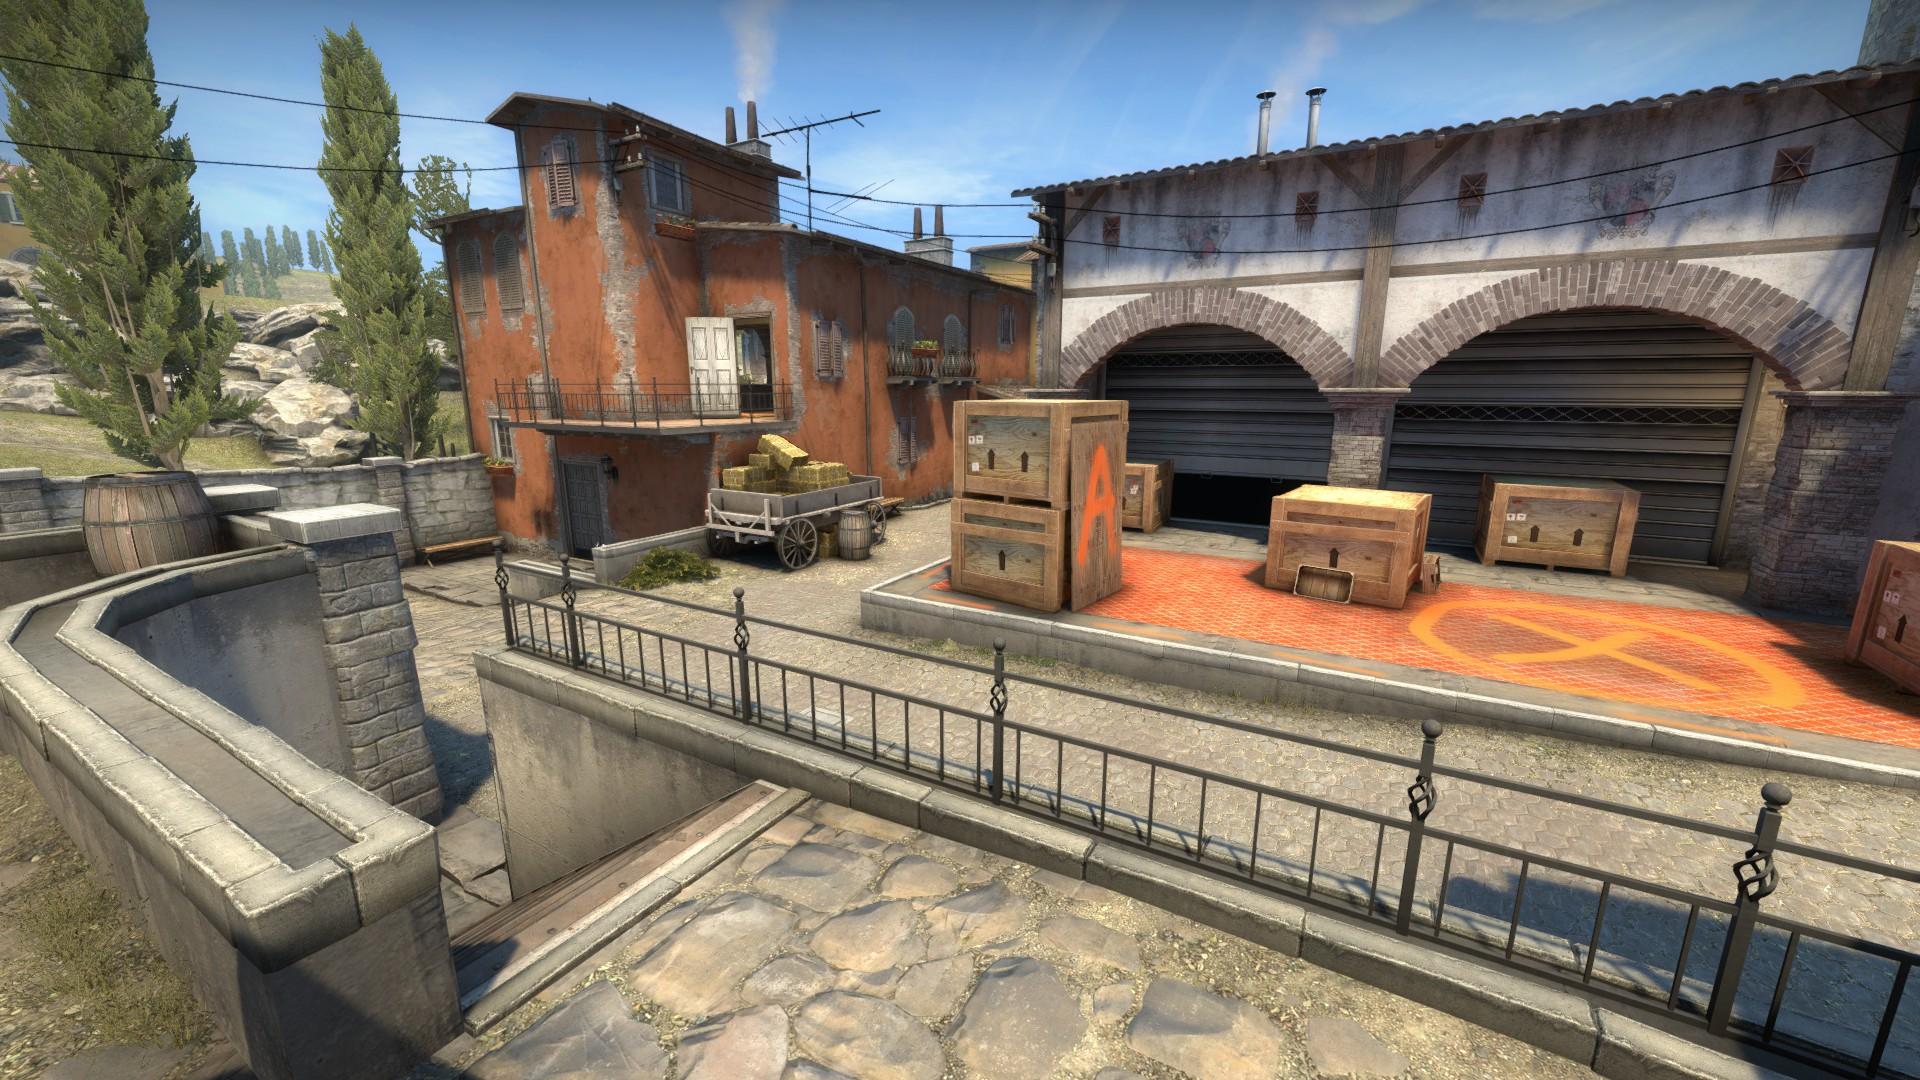 CS:GO - The Return of Inferno